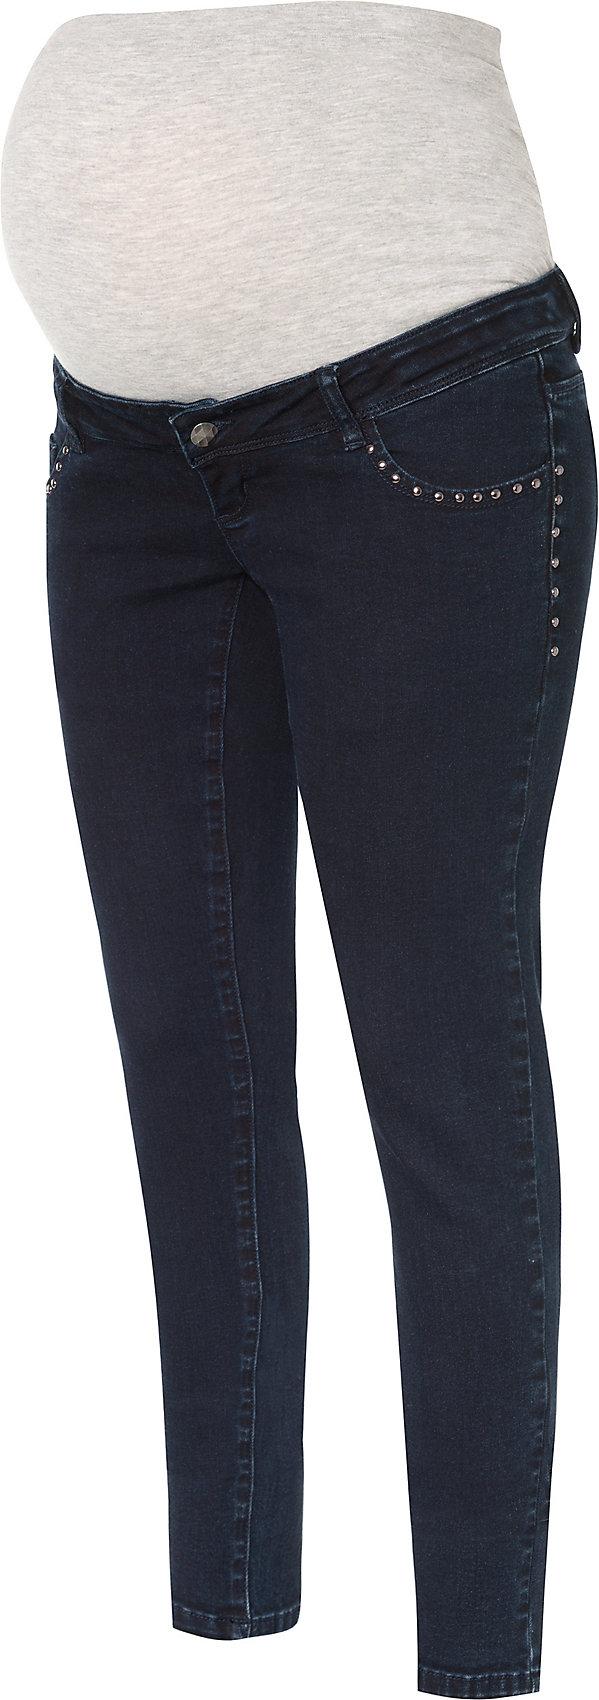 MAMALICIOUS Damen Mlmain Straight Jeans A Umstandshose